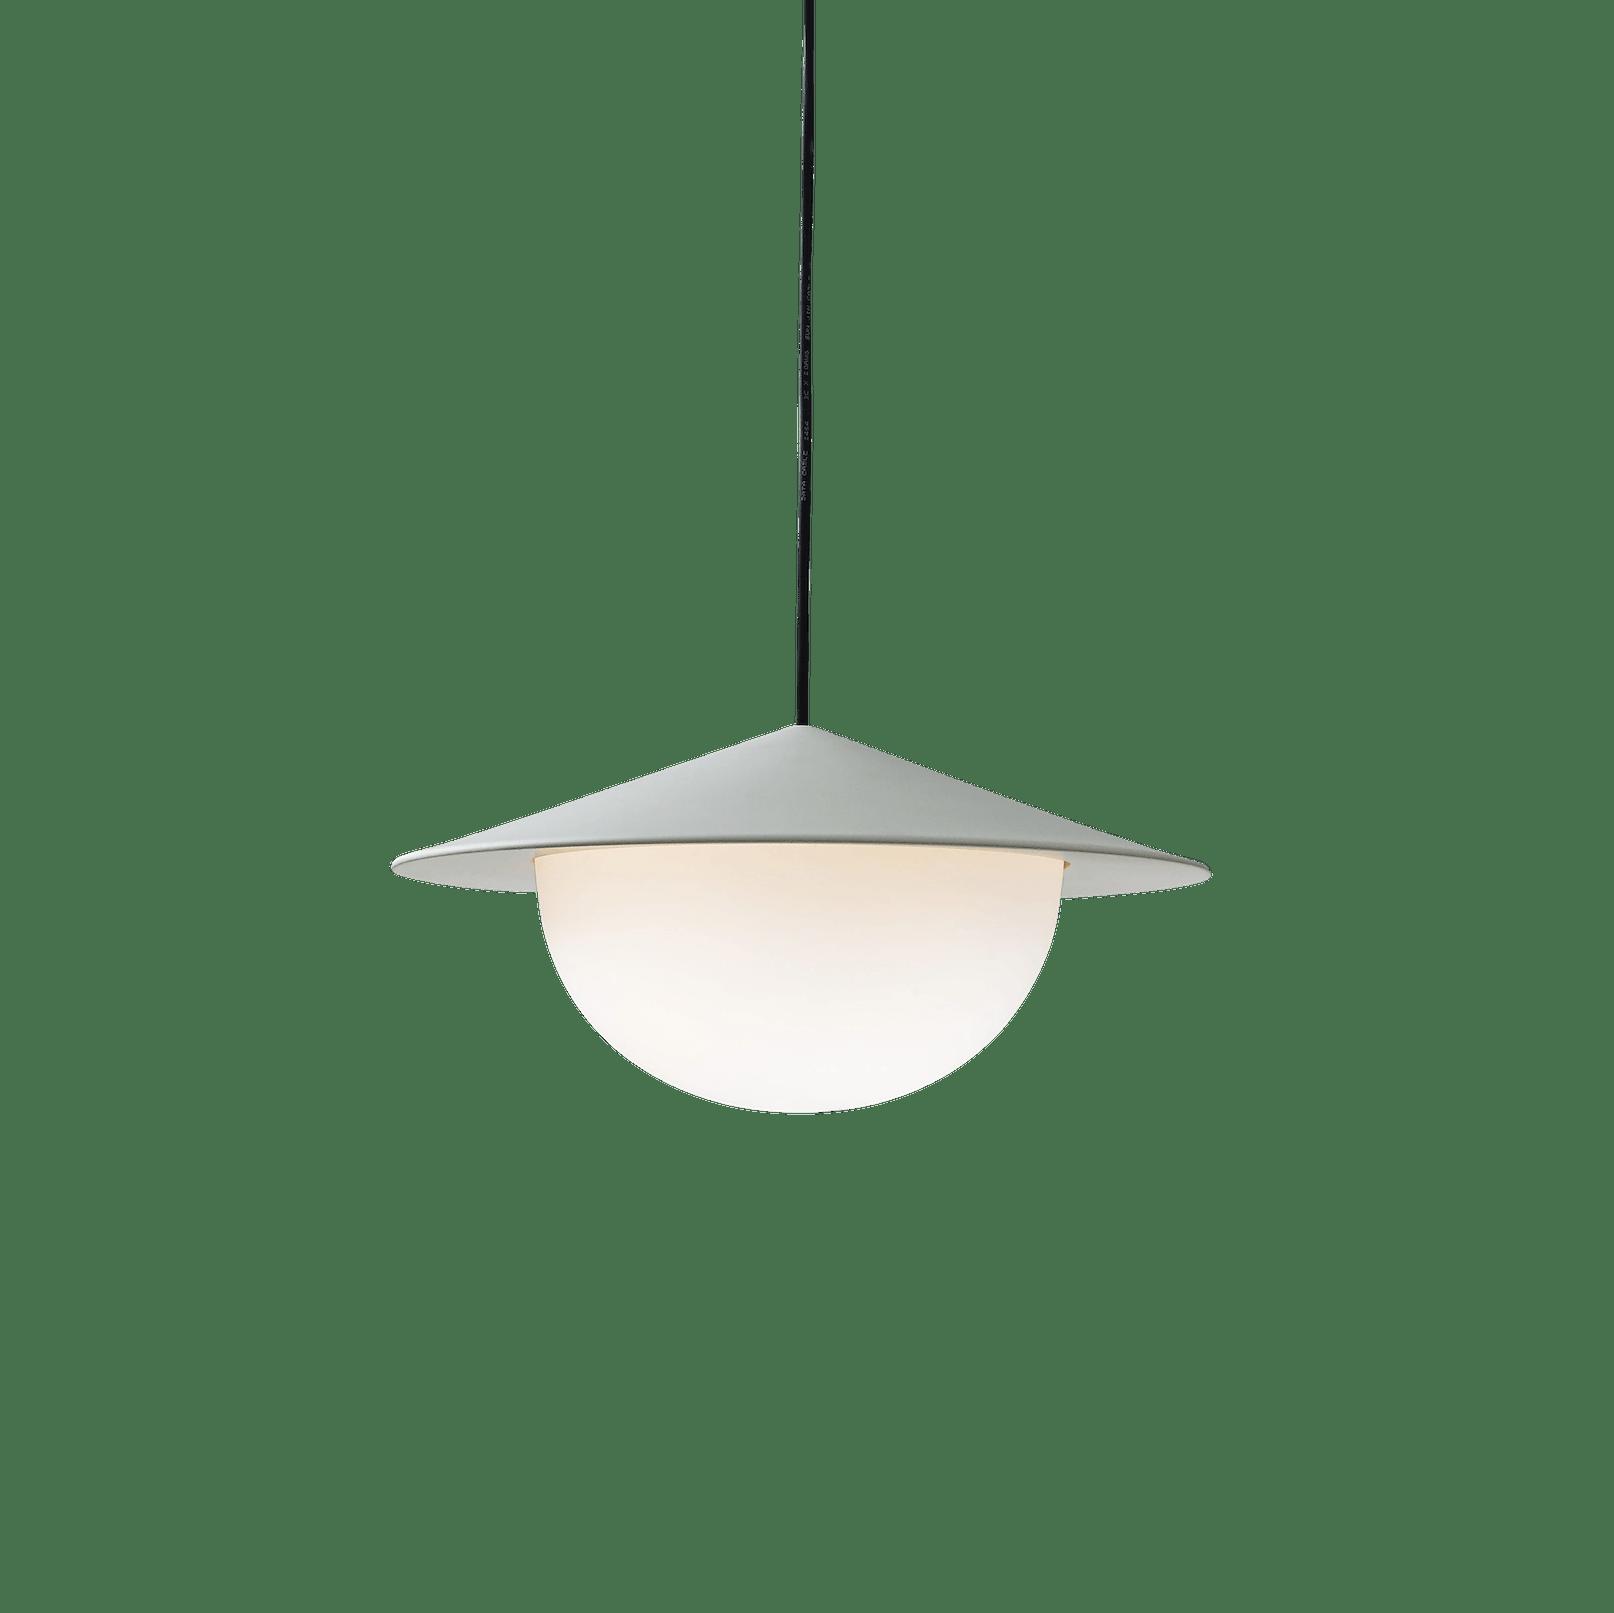 Ago lighting alley pendant large grey lit haute living